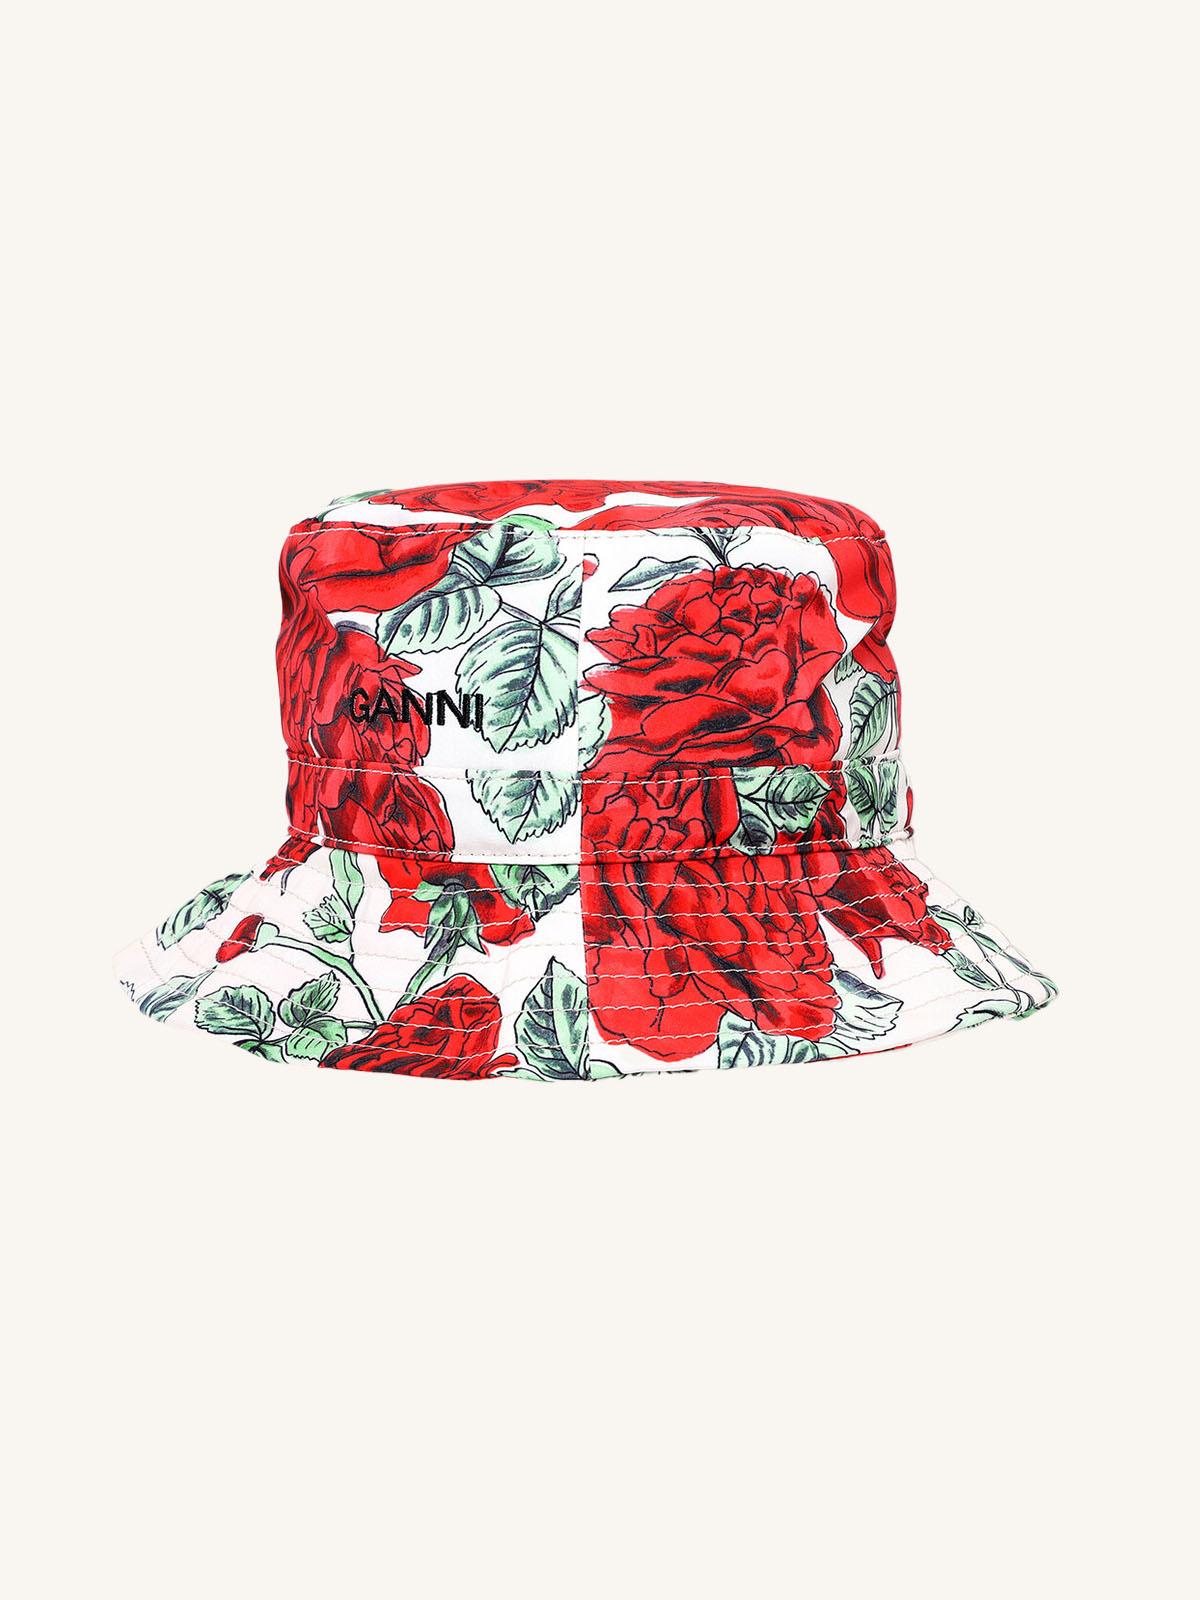 Ganni - Seasonal Recycled Tech hat